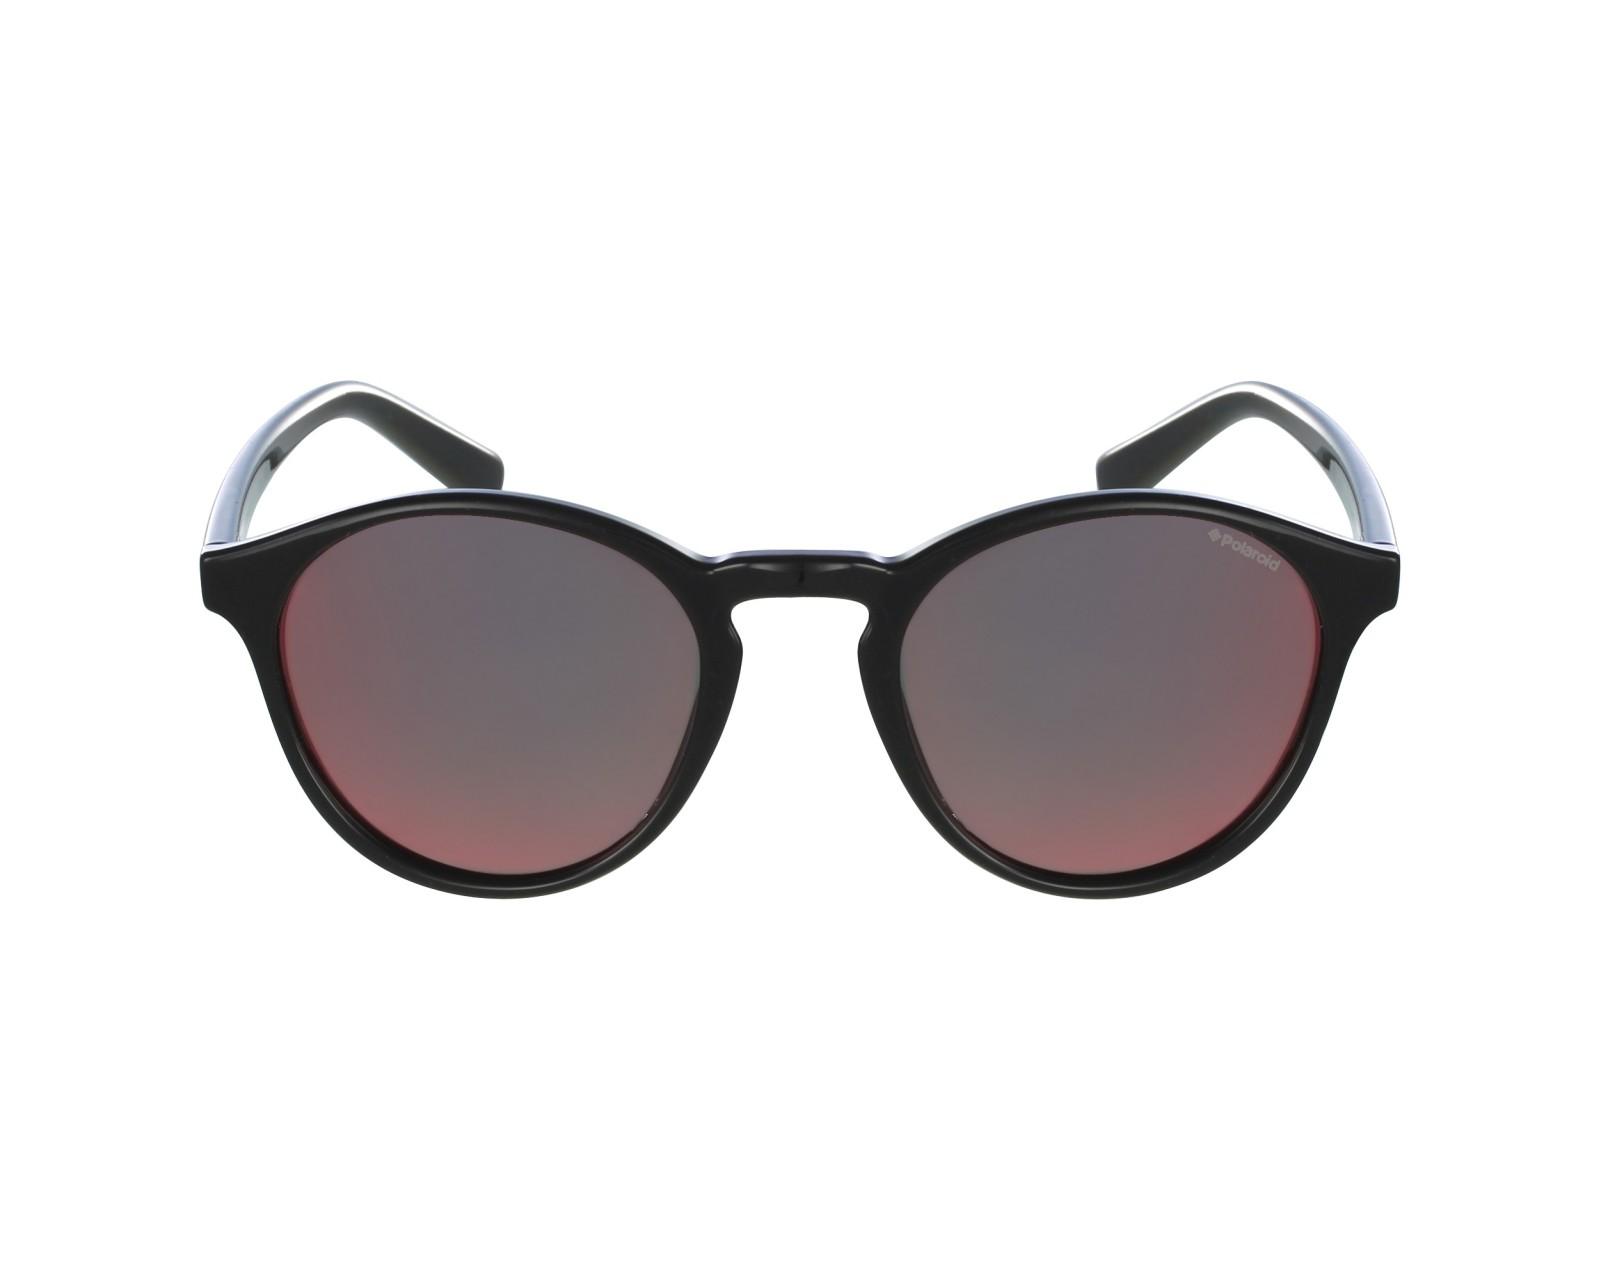 5fe87eea89a thumbnail Sunglasses Polaroid PLD-6013-S D28 - Black profile view